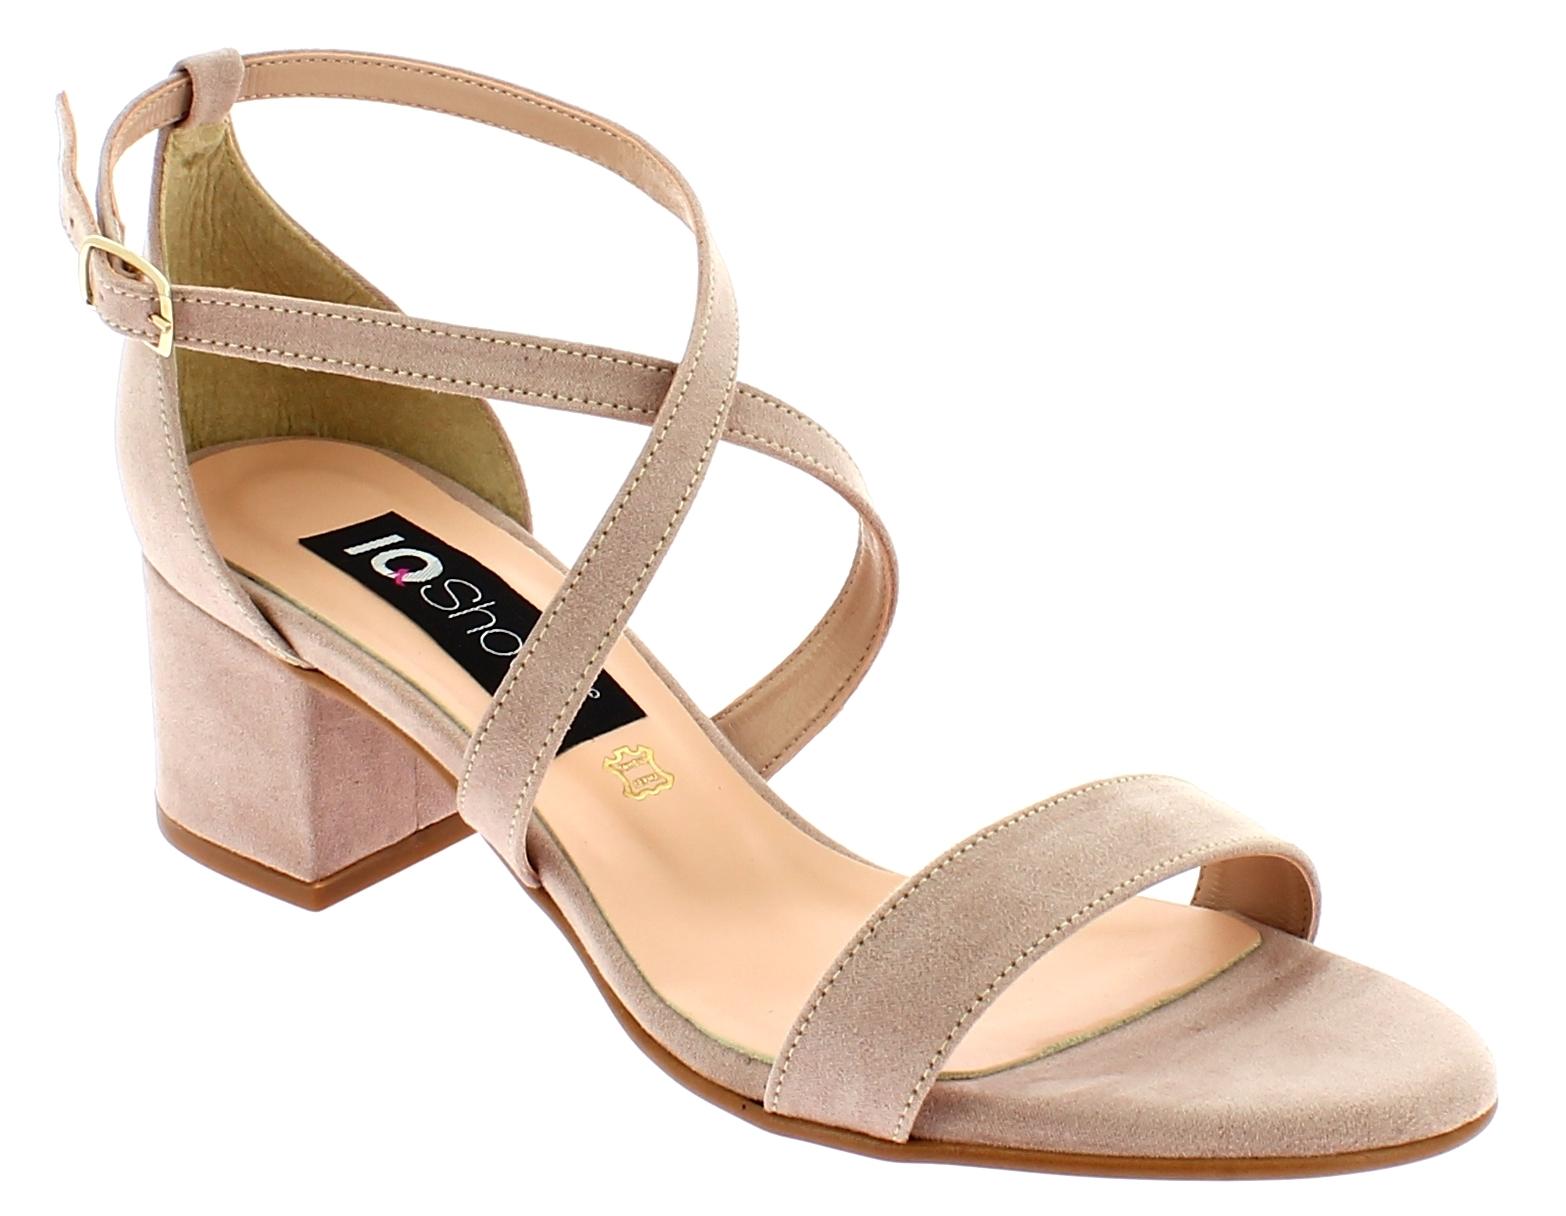 IQSHOES Γυναικείο Πέδιλο 452 Μπεζ - IqShoes - 41.452 BEIGE-IQSHOES-beige-37/1/7/ παπούτσια  new in